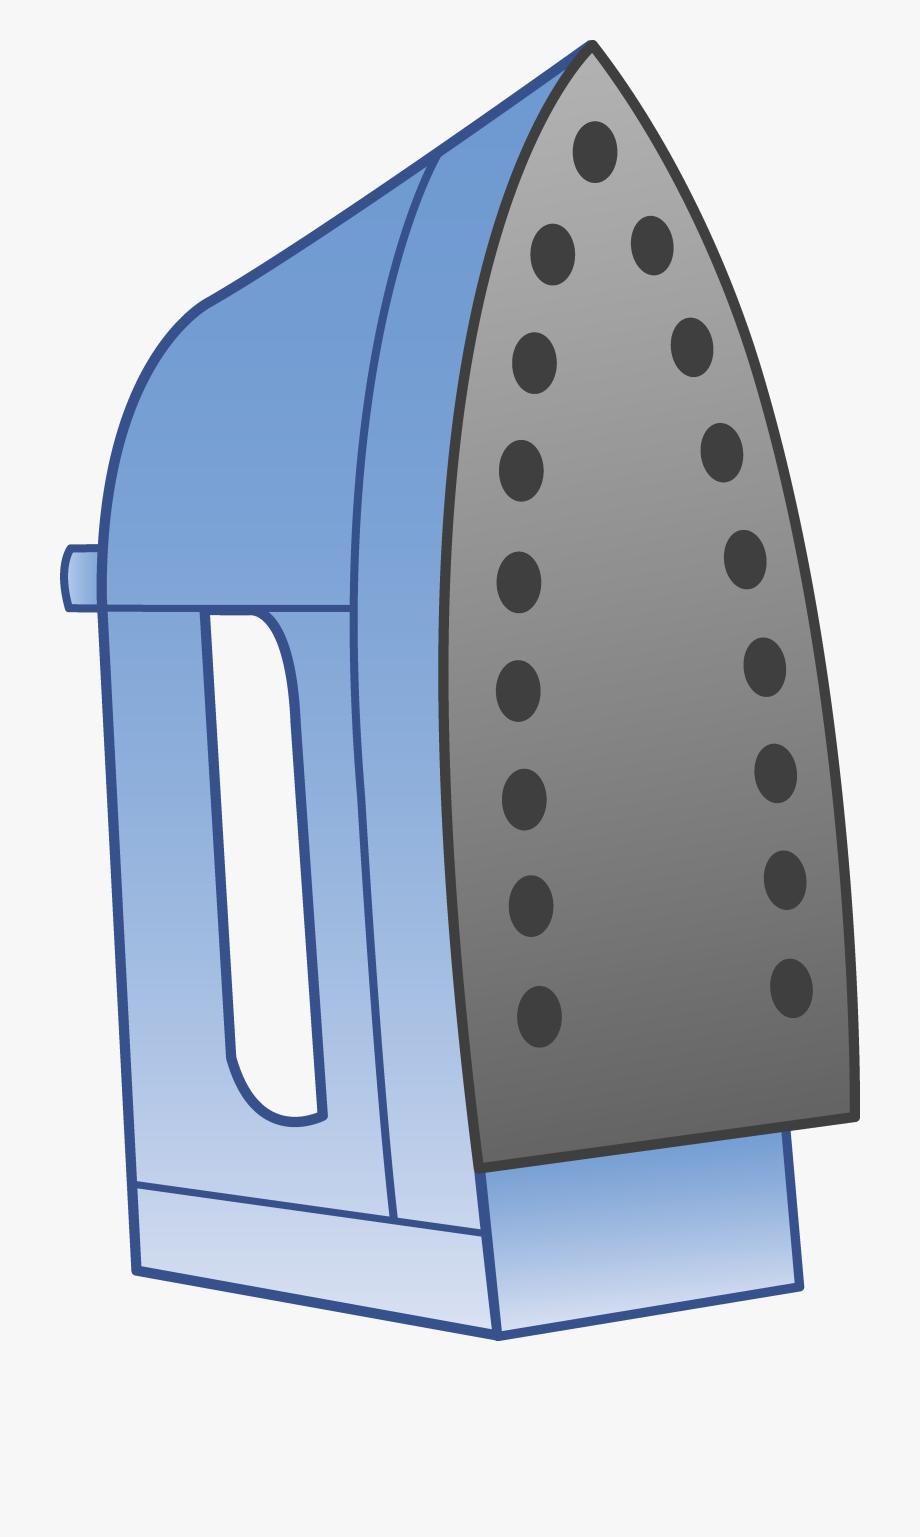 Free clipart iron. Transparent clothes ironer